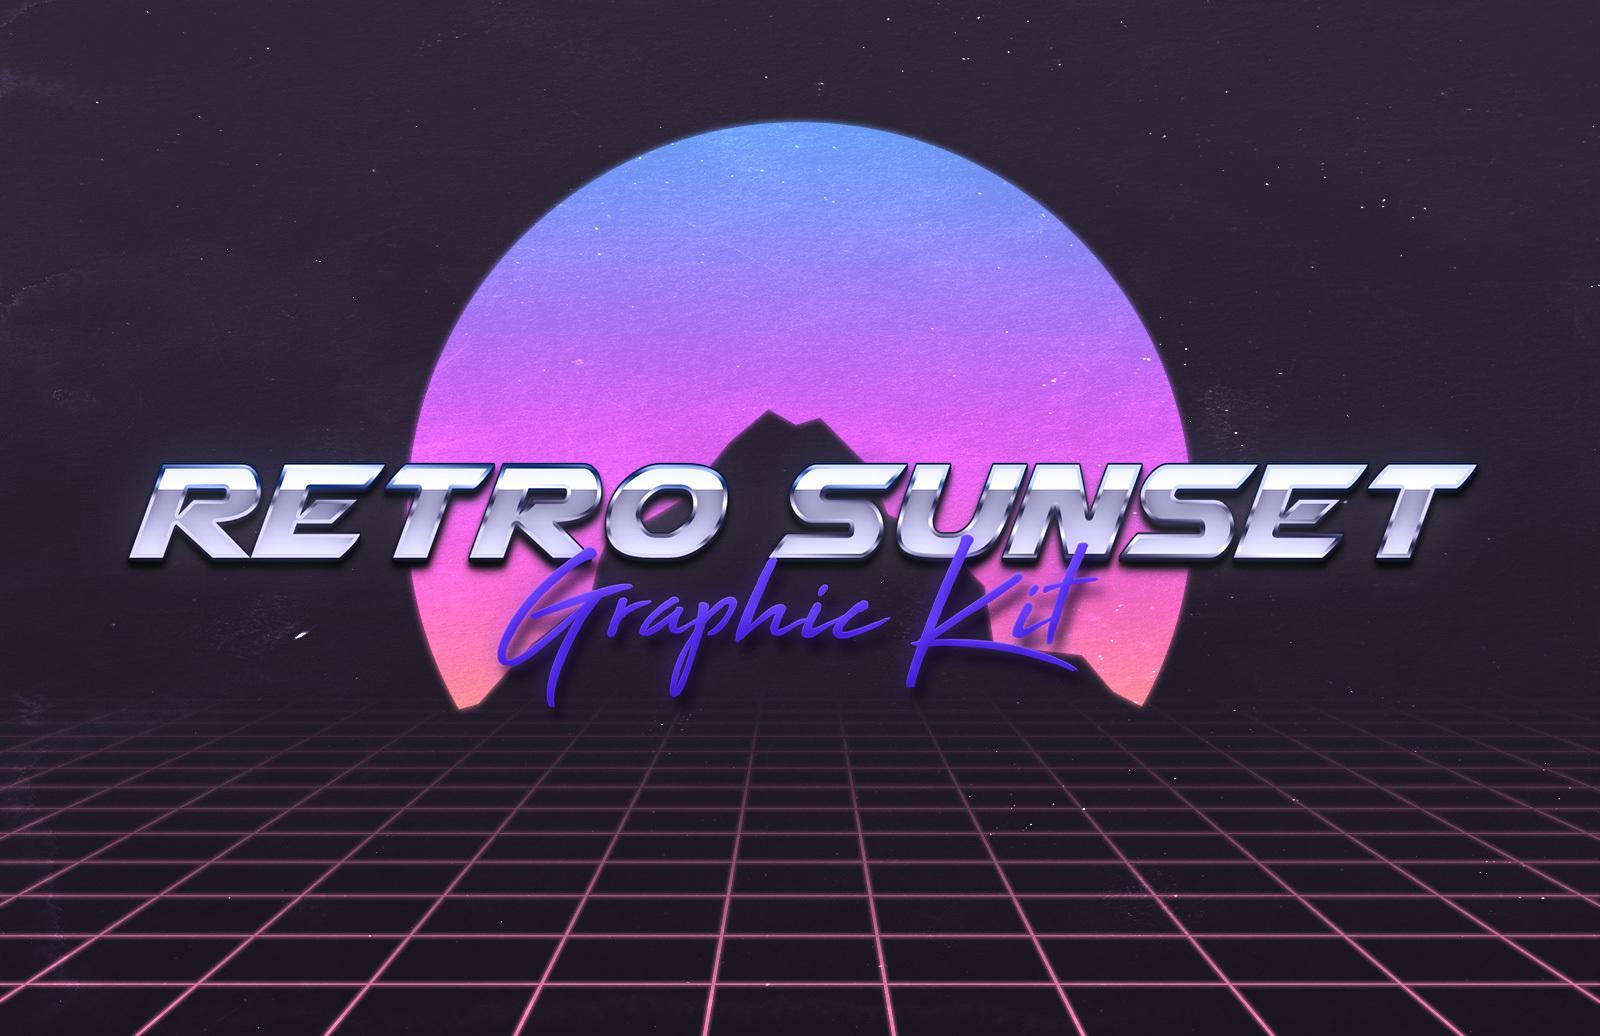 Retro 80s Sunset Graphic Kit